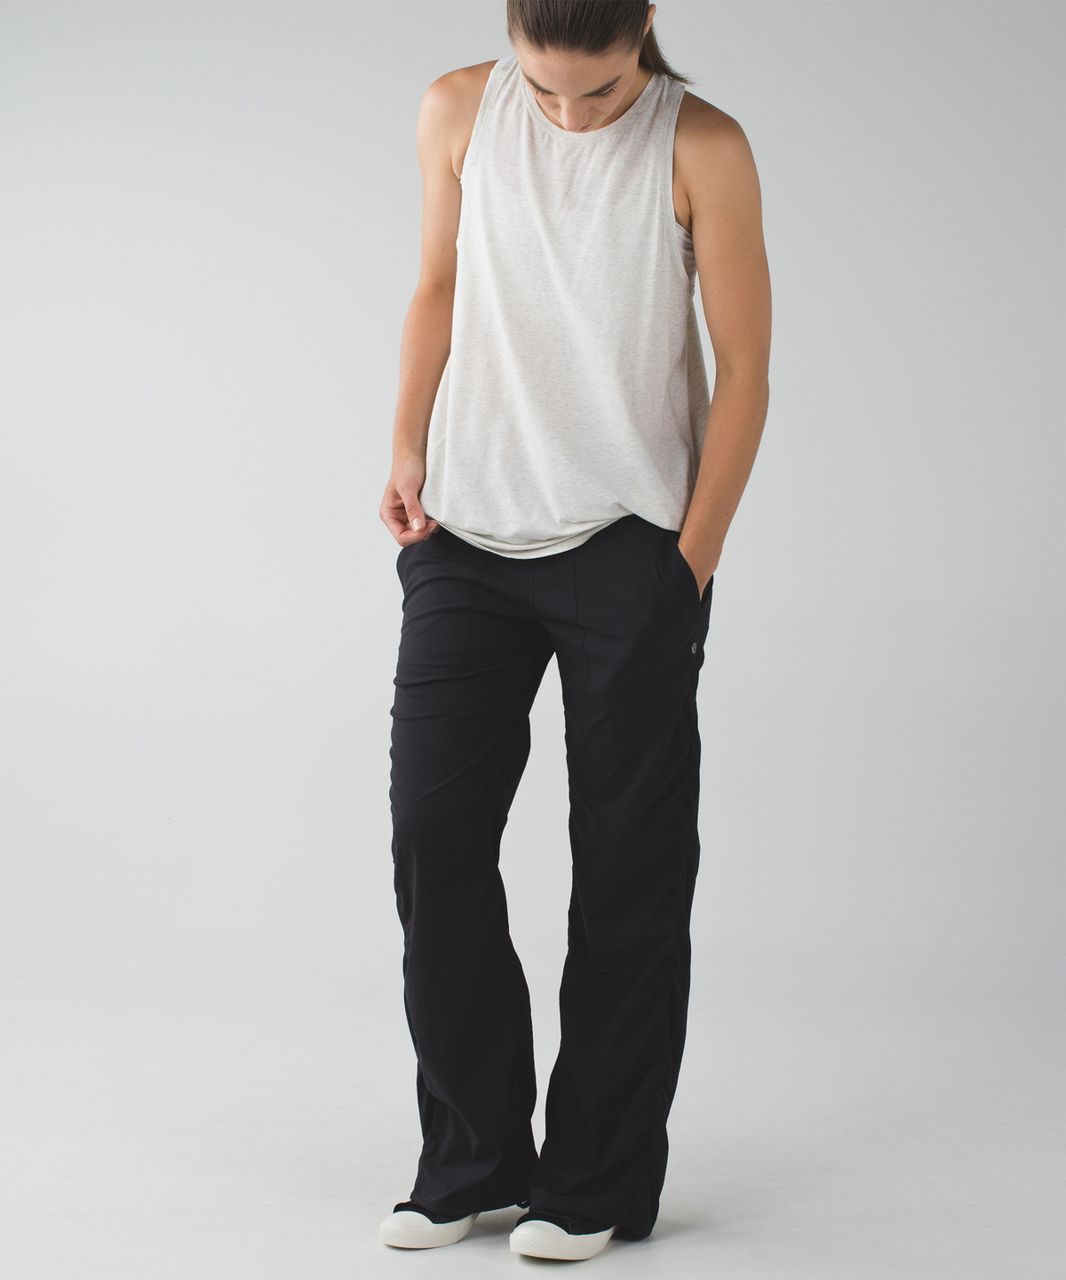 Lululemon Studio Pant II *No Liner (Tall) (First Release) - Black